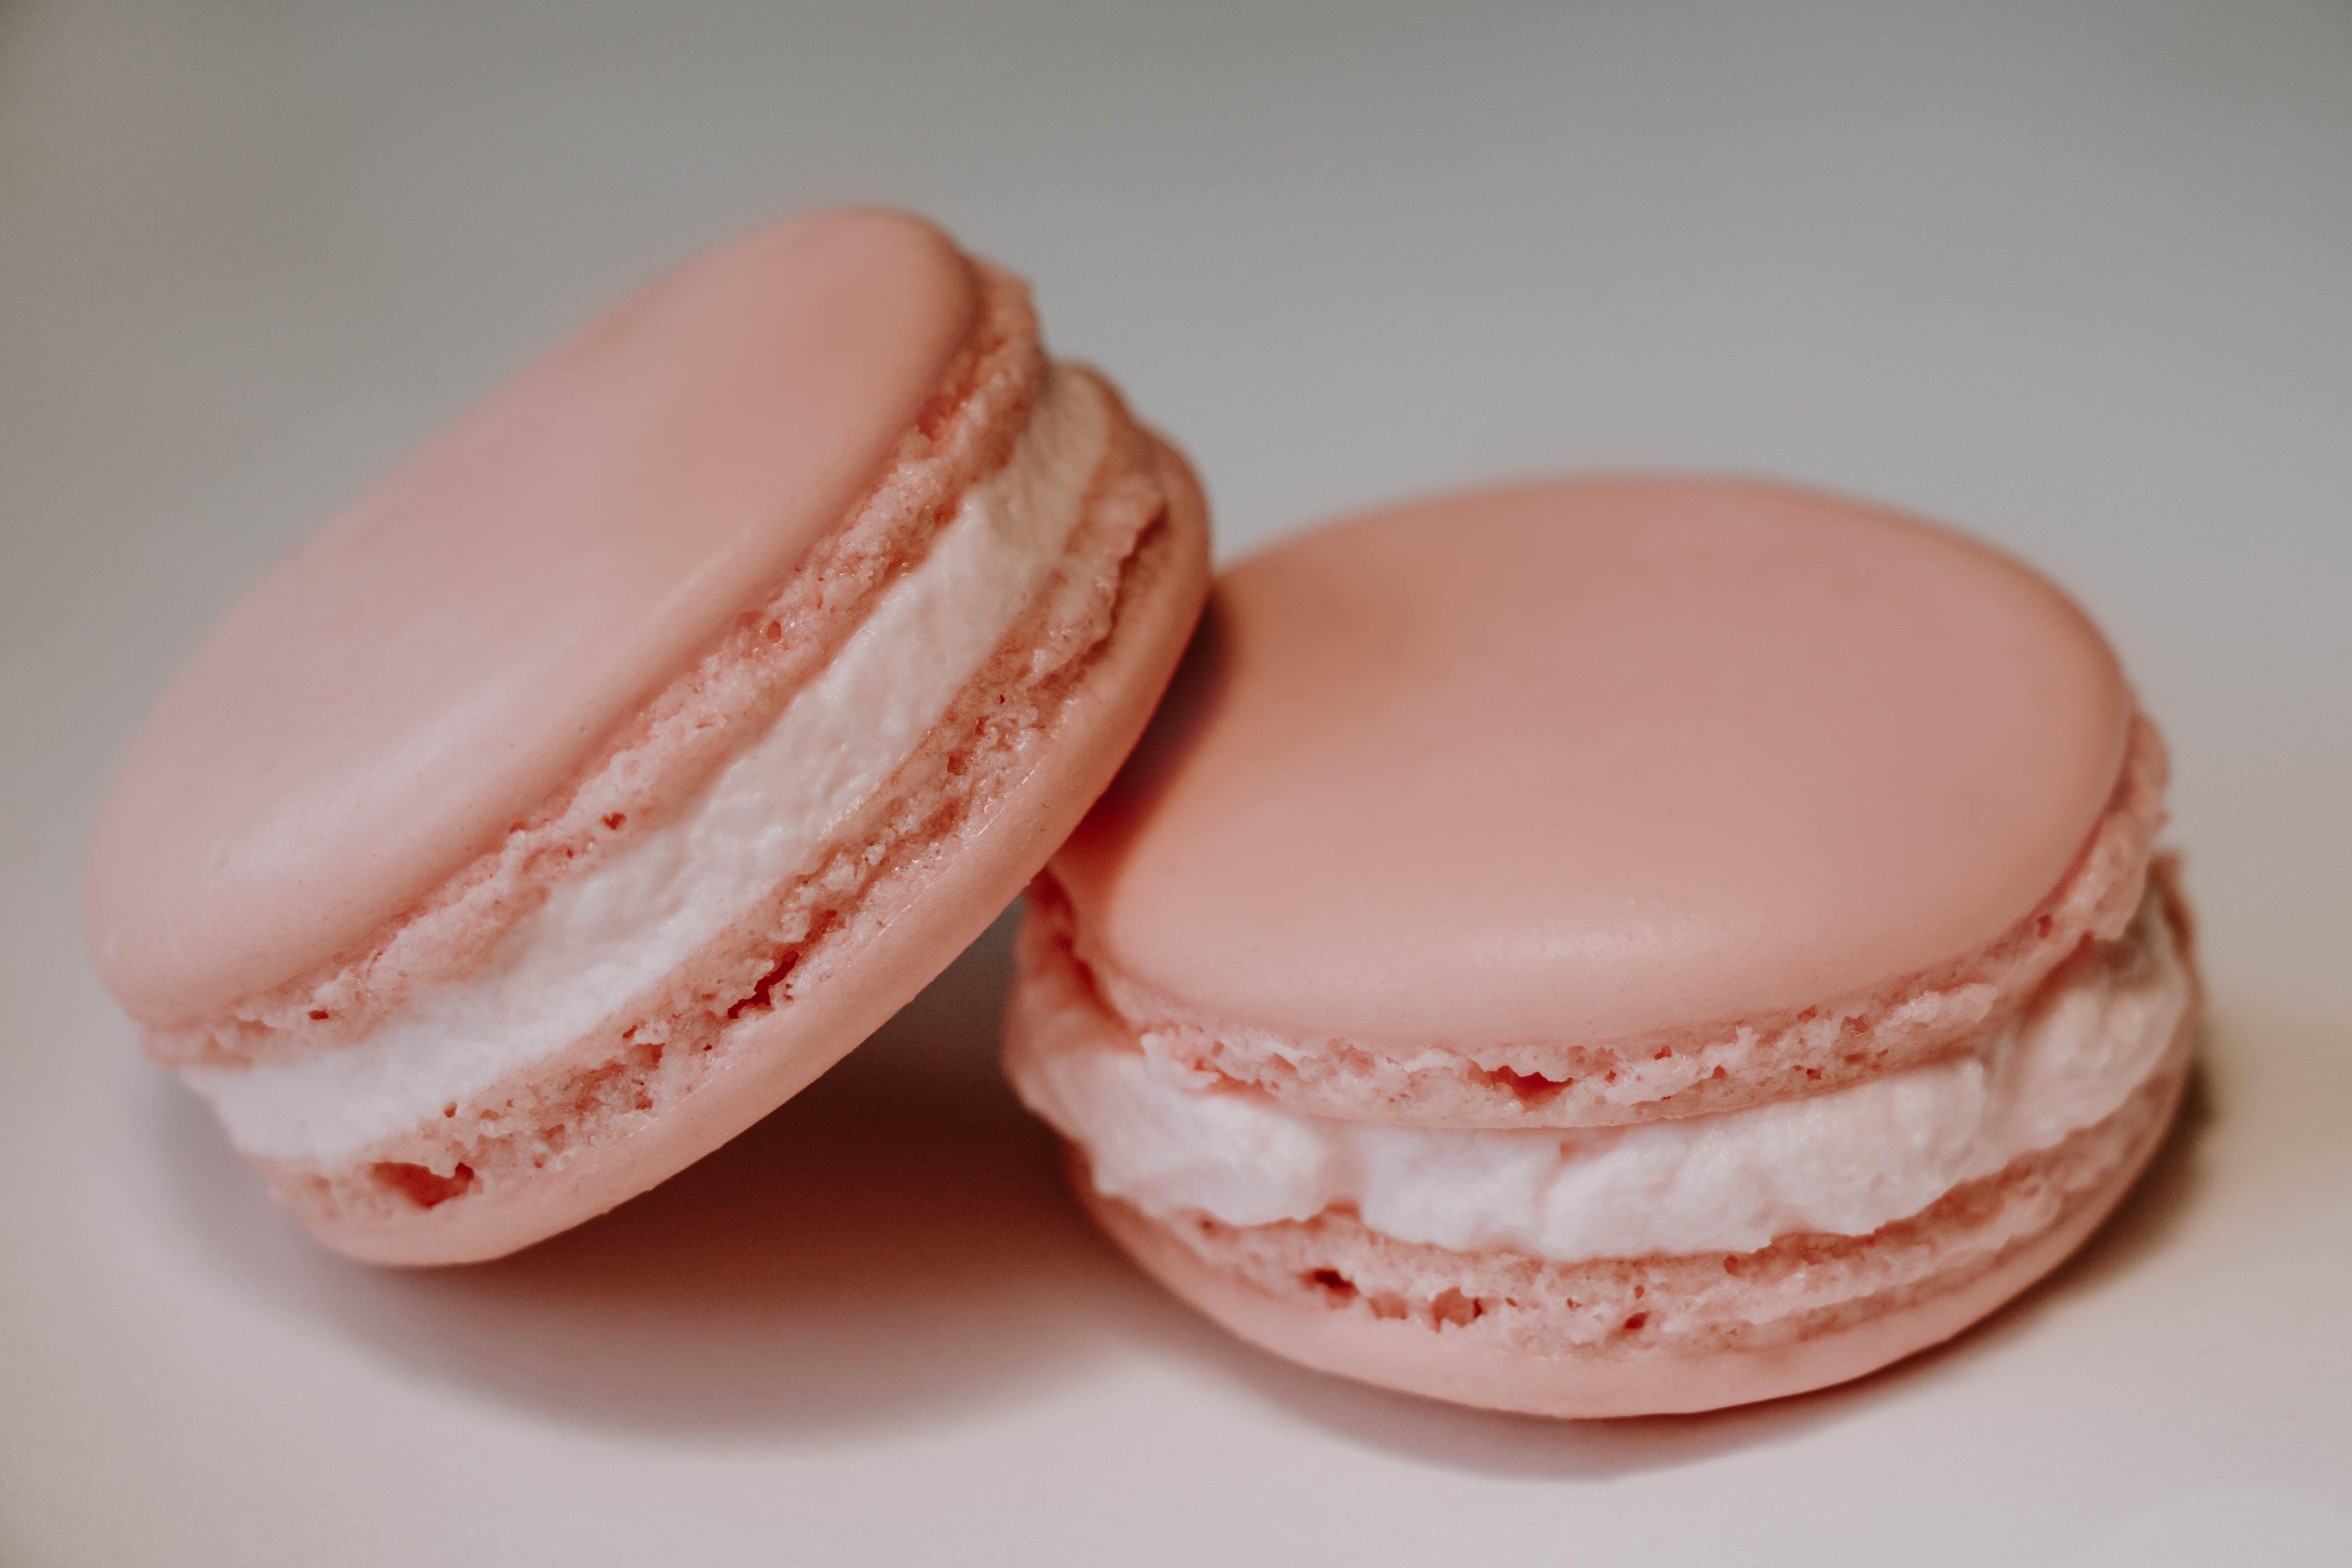 Macaron (French Macaroon) Elle